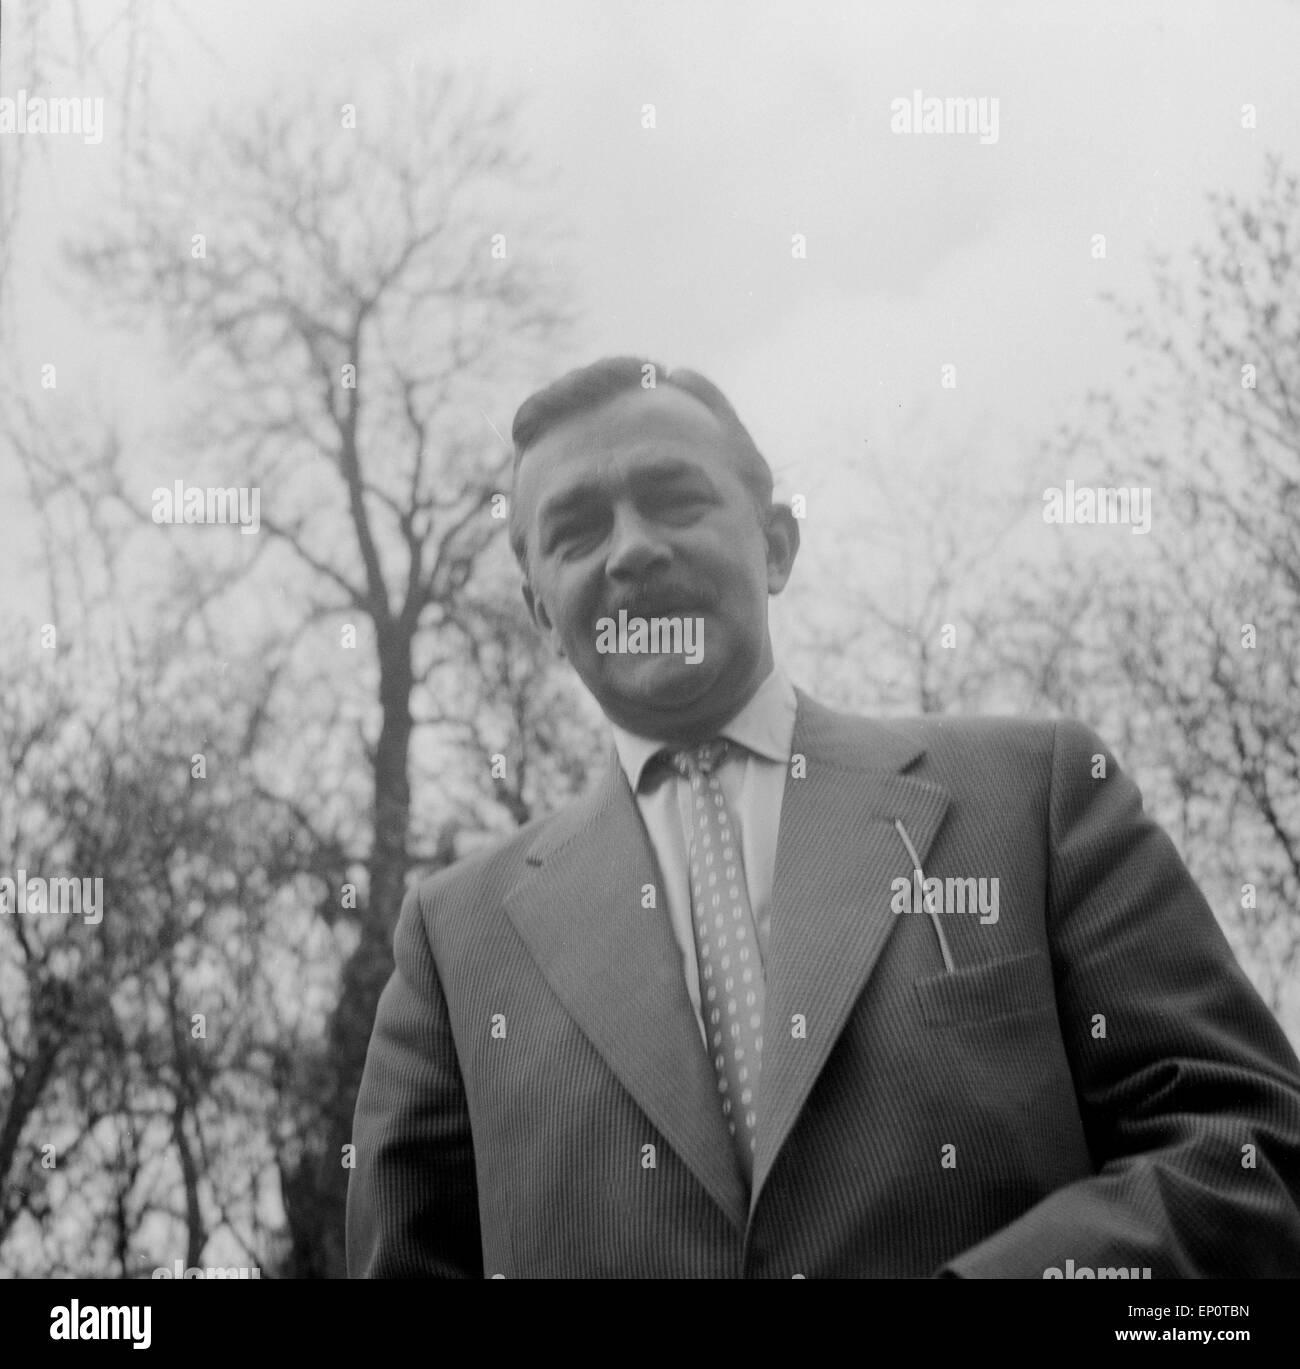 Deutscher Schauspieler Heinz Piper, Hamburg 1956. German actor Heinz Piper, Hamburg 1956. - Stock Image